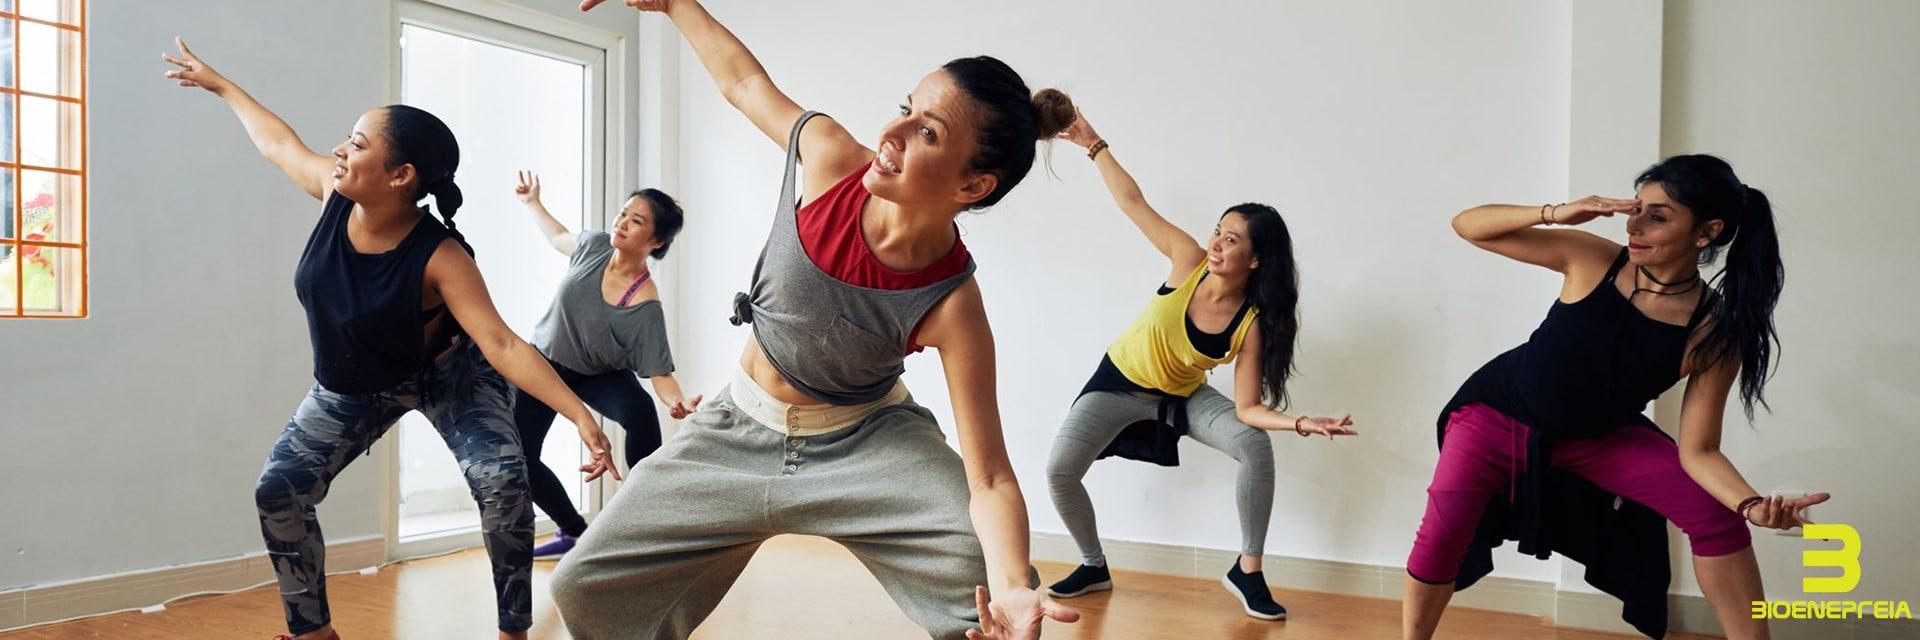 reggaeton-fussion-bioenergia-fc-gym-sparti